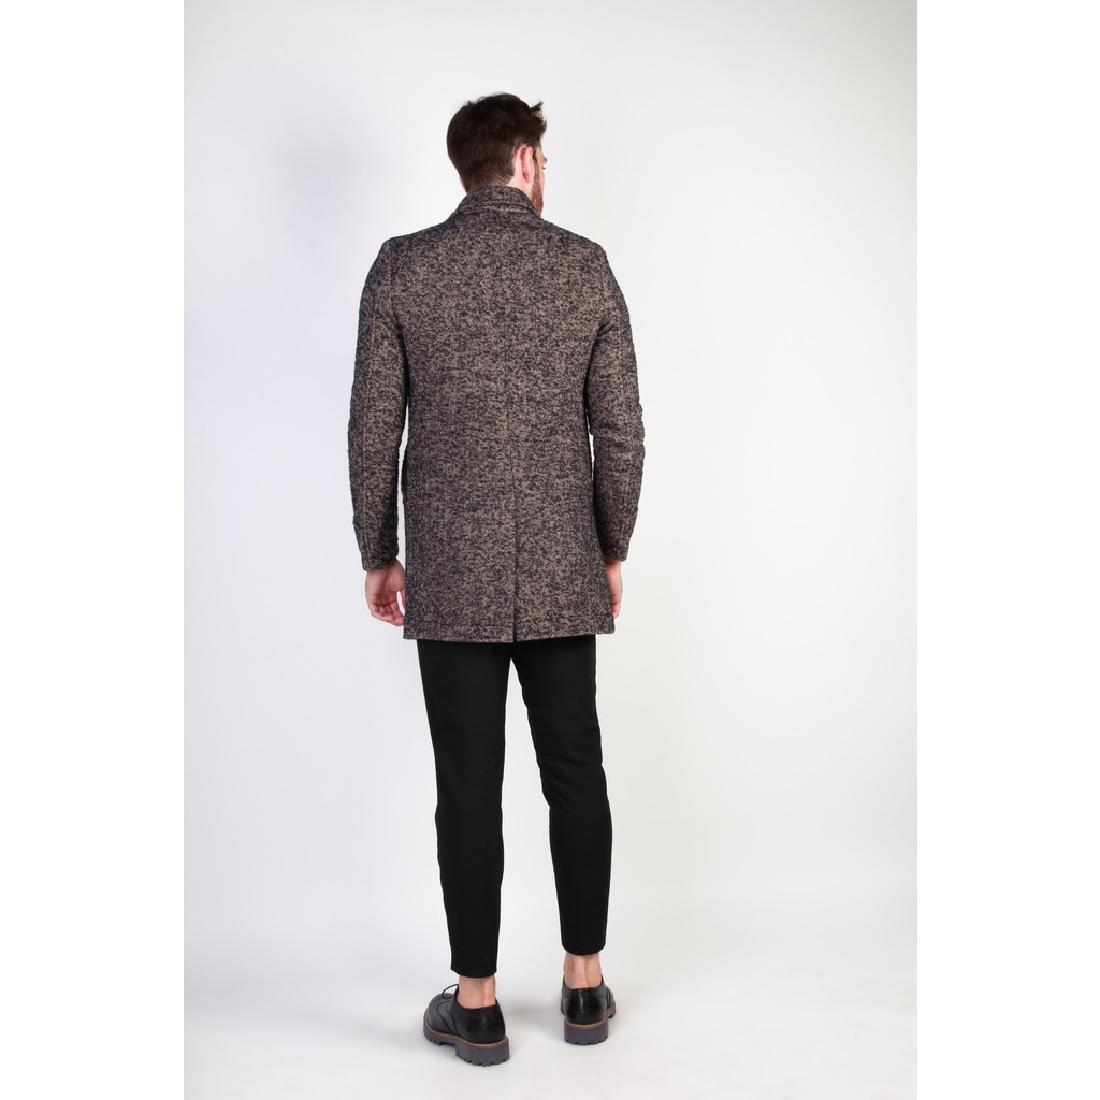 New Men's Italian Wool Blend Coat US 38 - 4